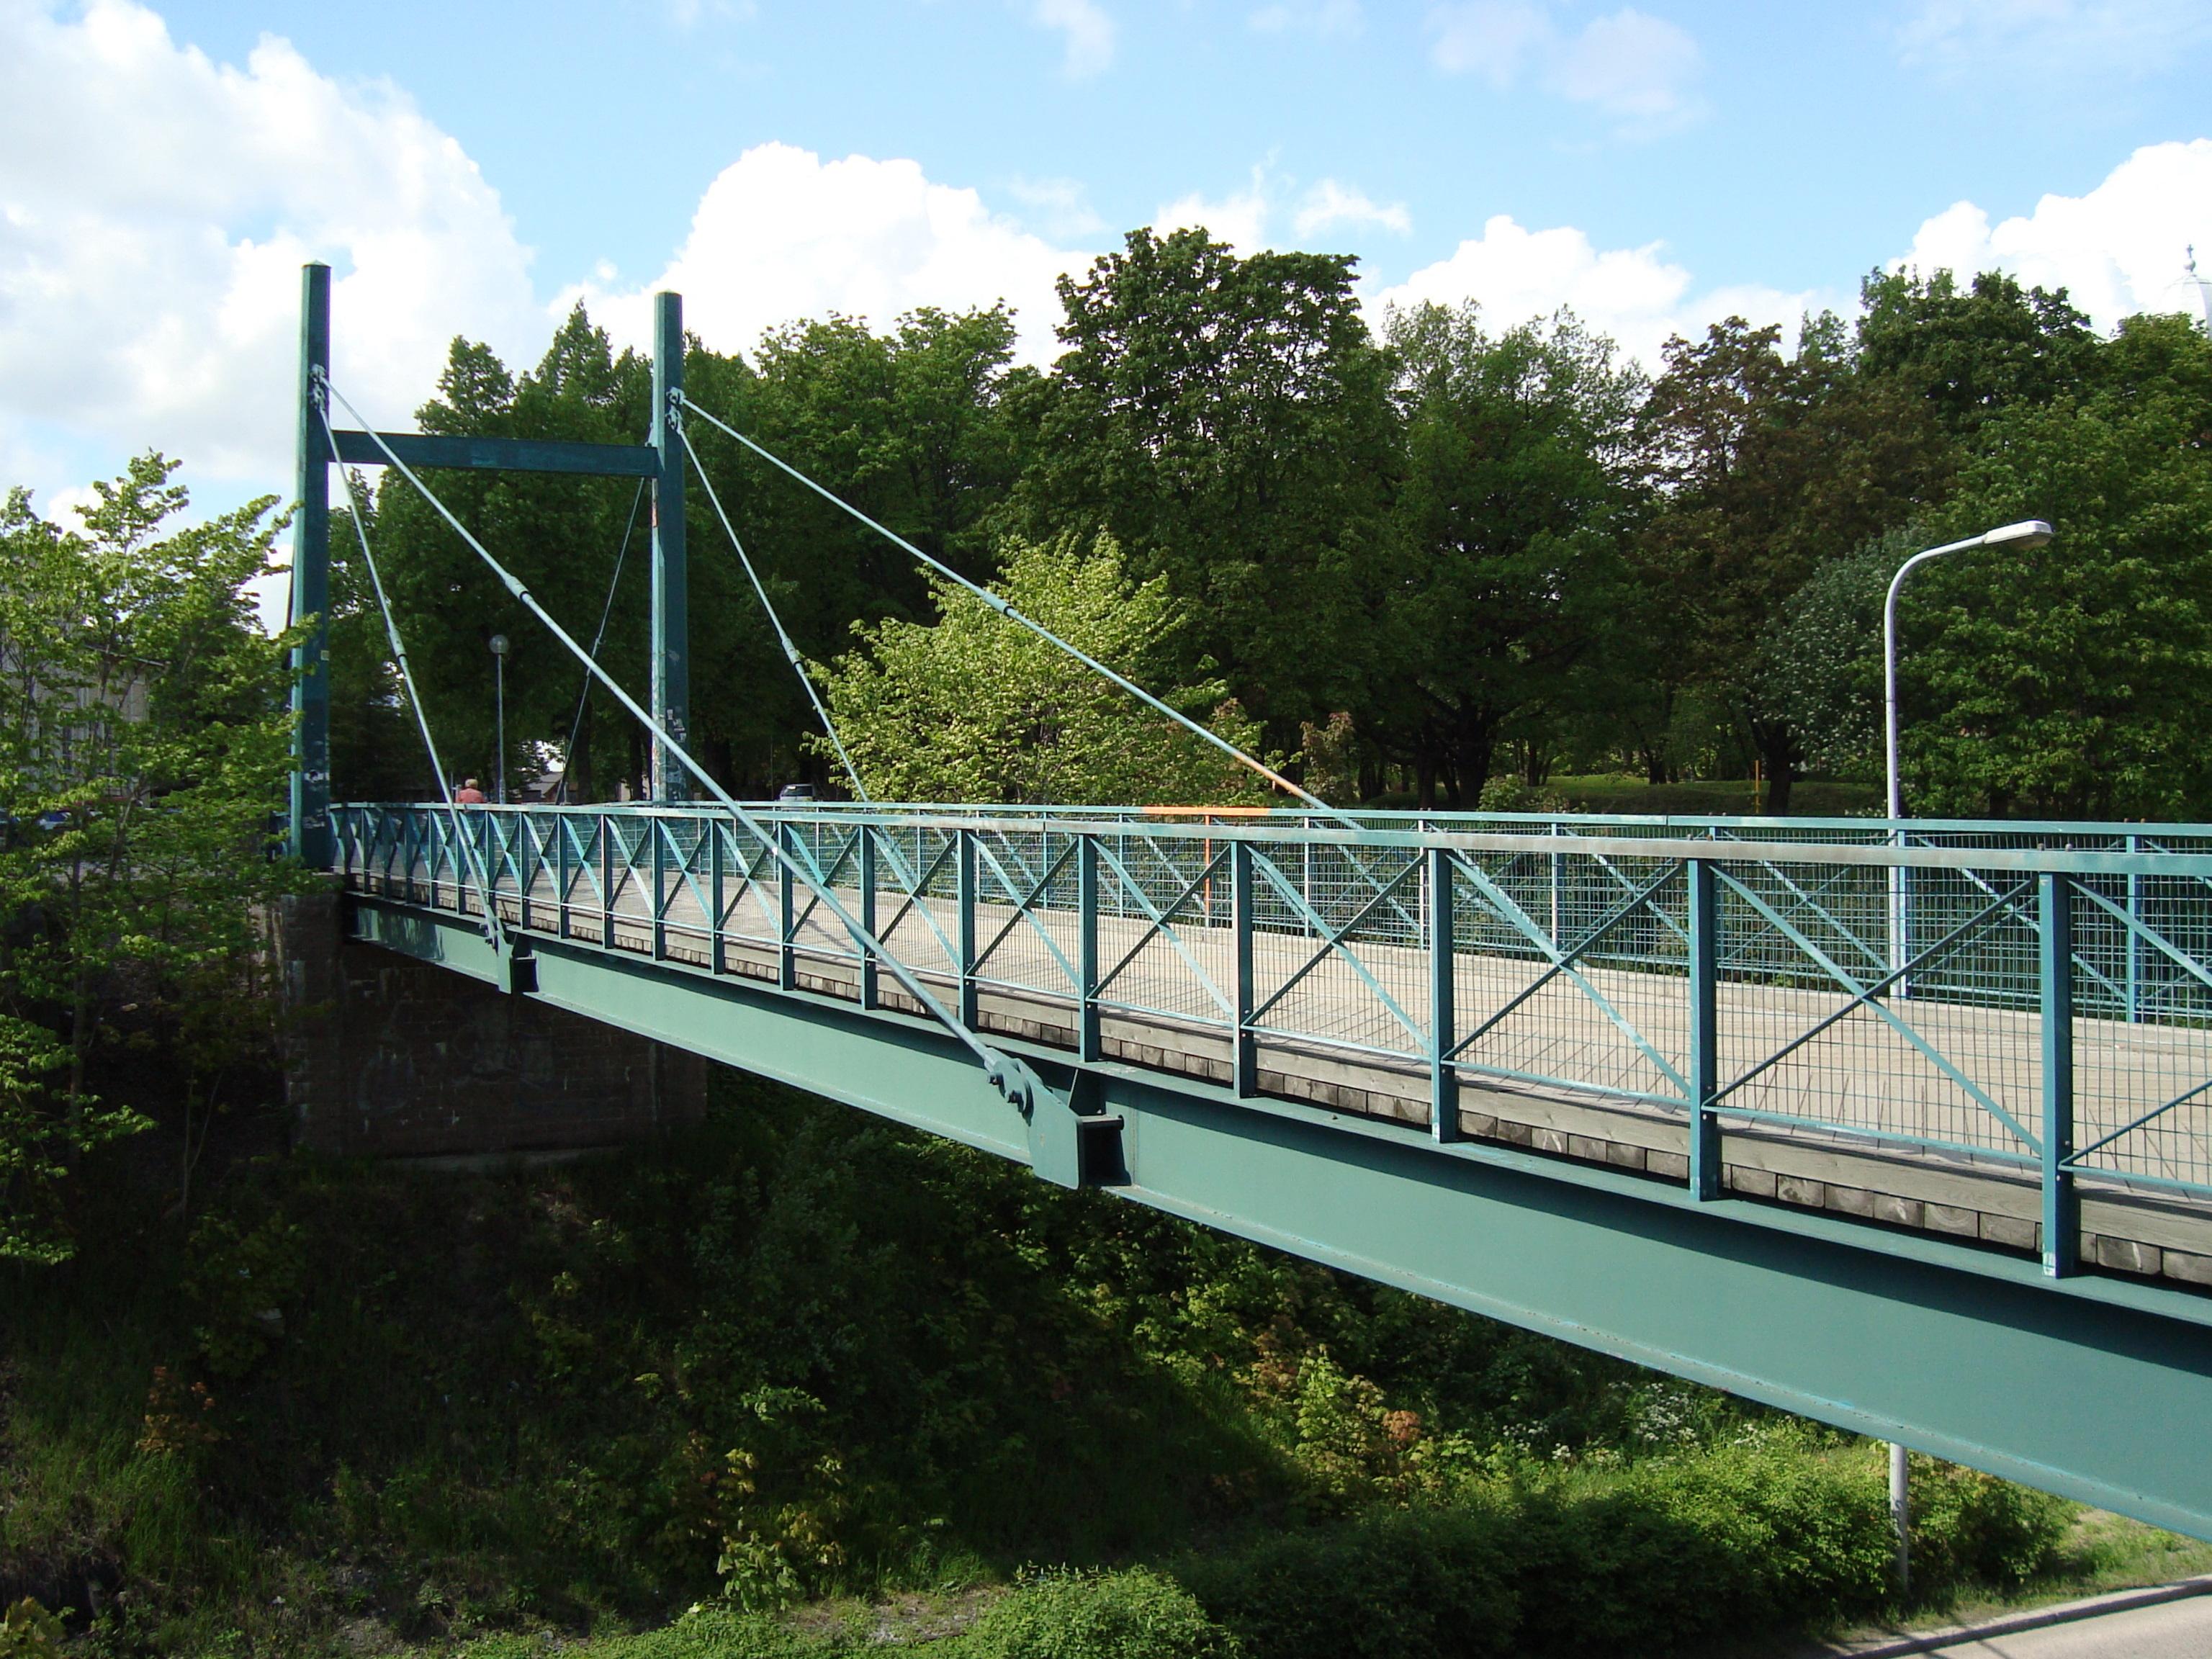 File:Cable-stayed bridge Lappeenranta 2 JPG - Wikimedia Commons